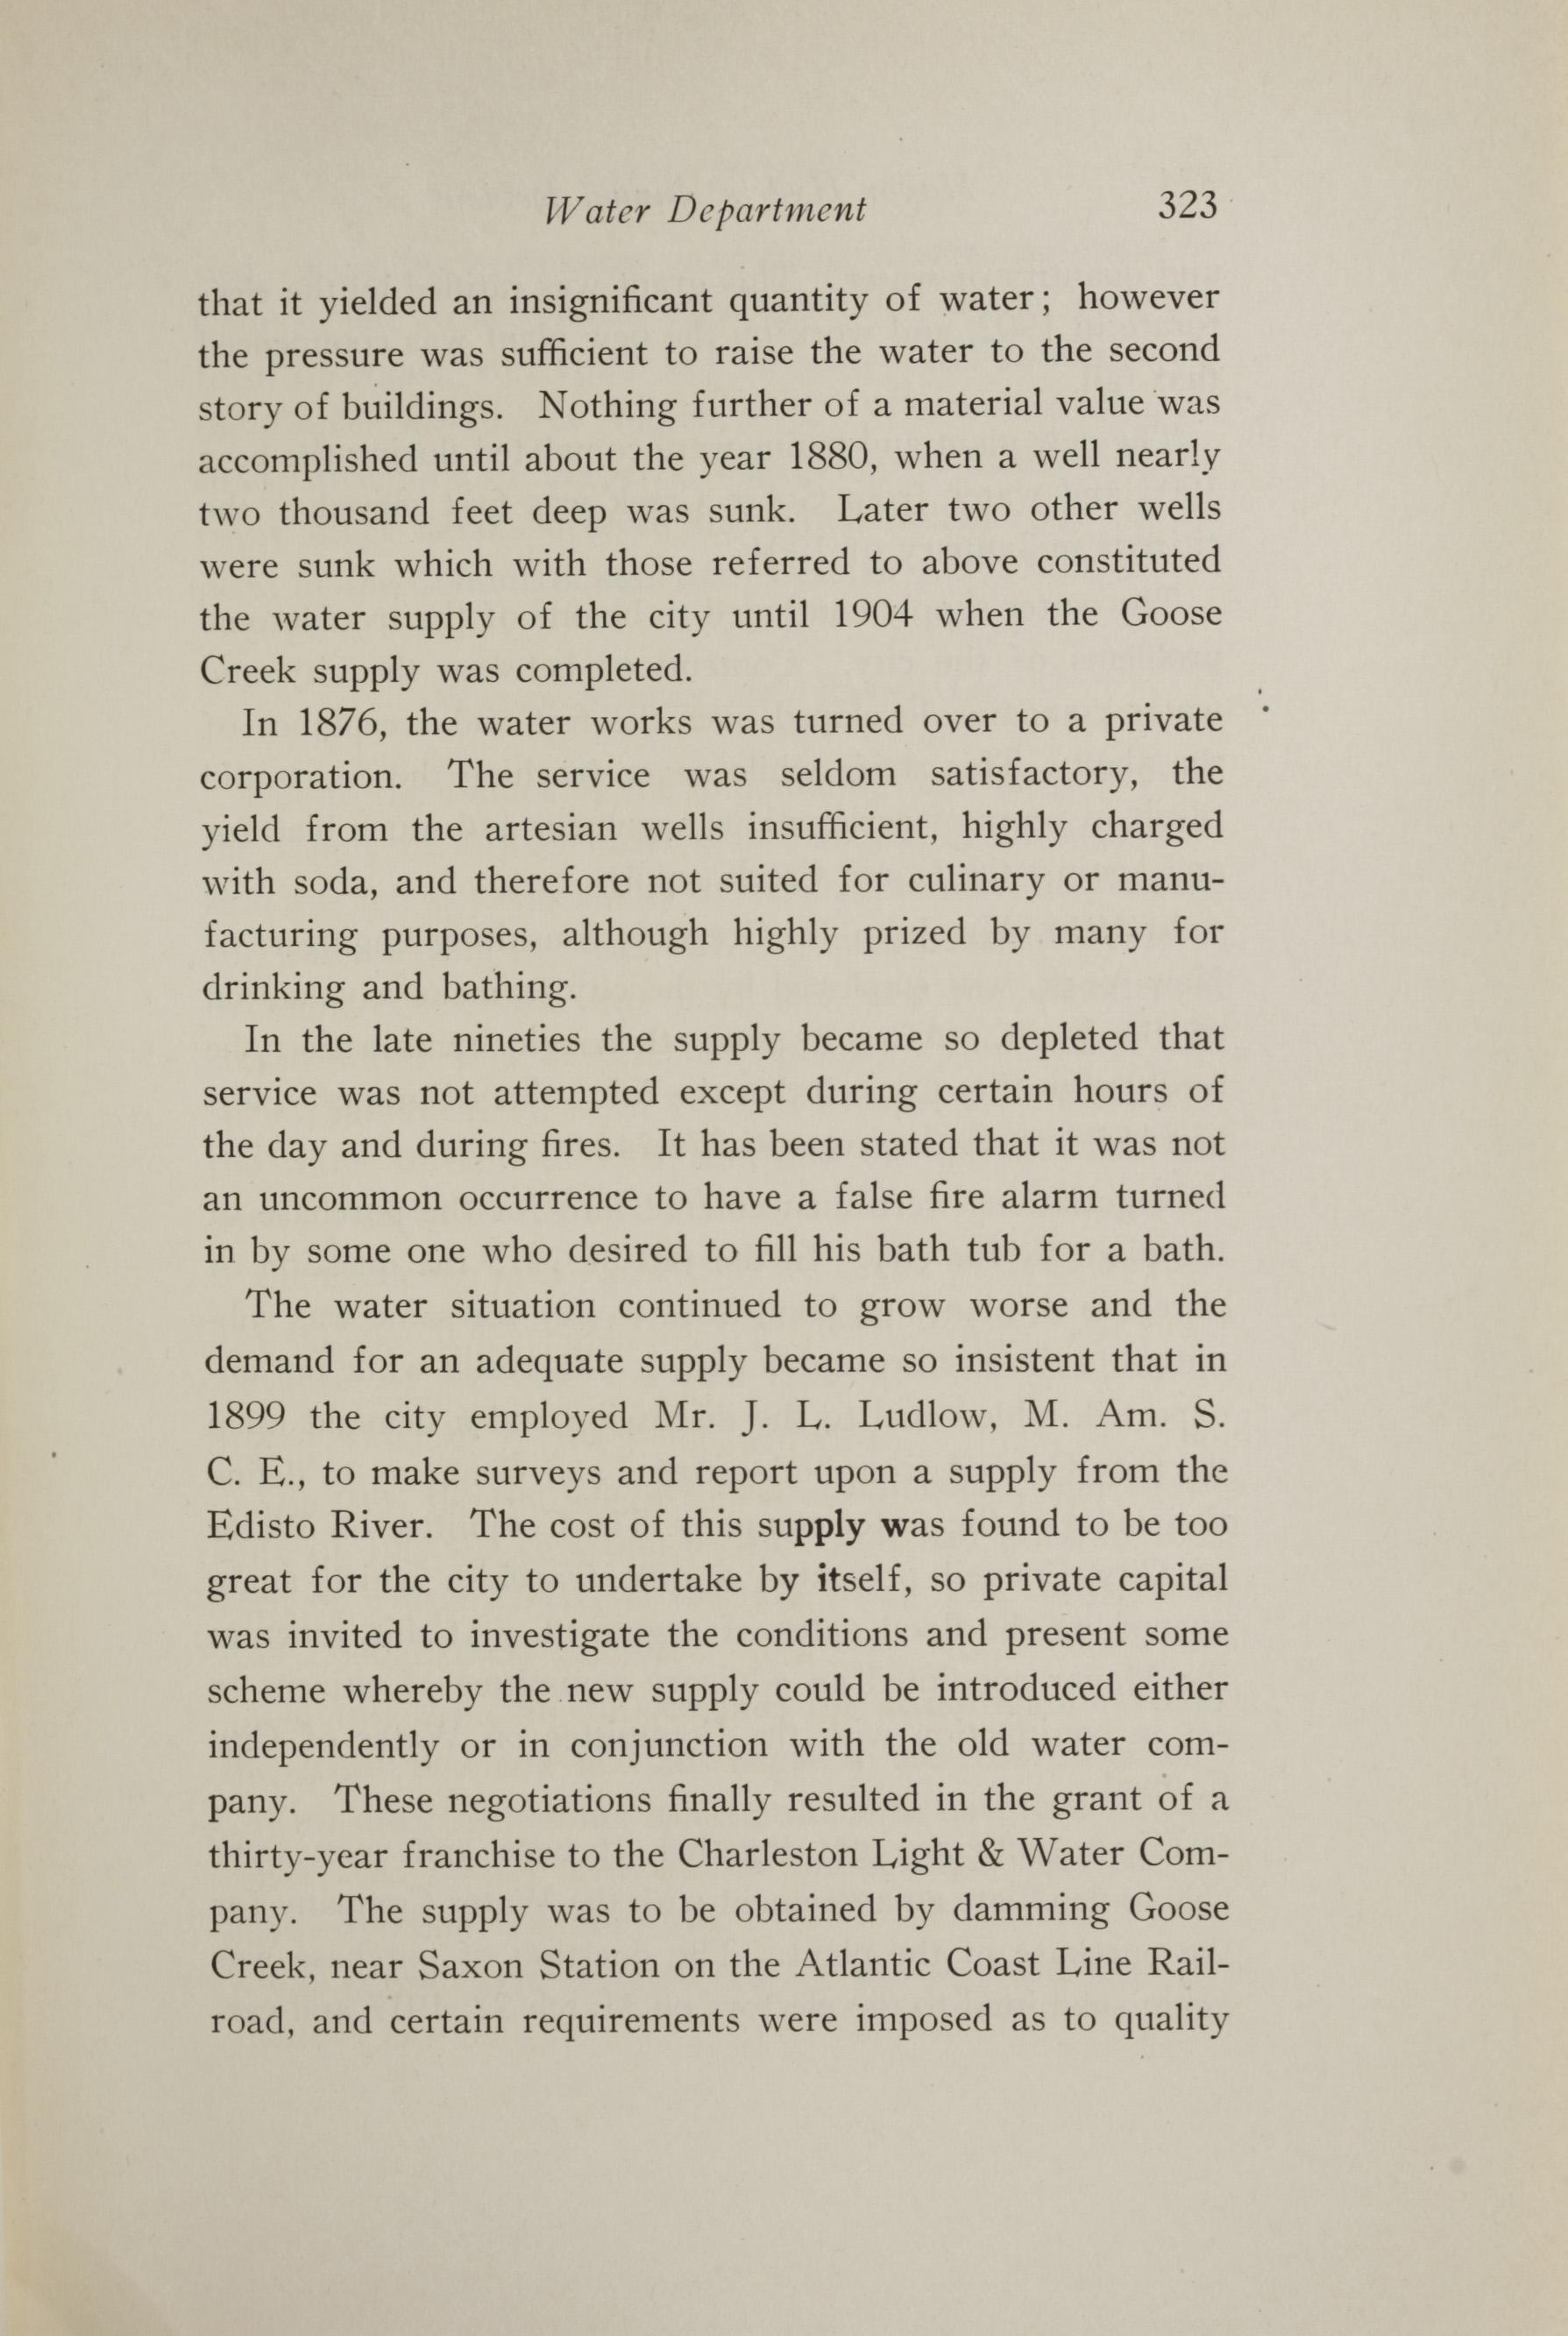 Charleston Yearbook, 1917, page 323